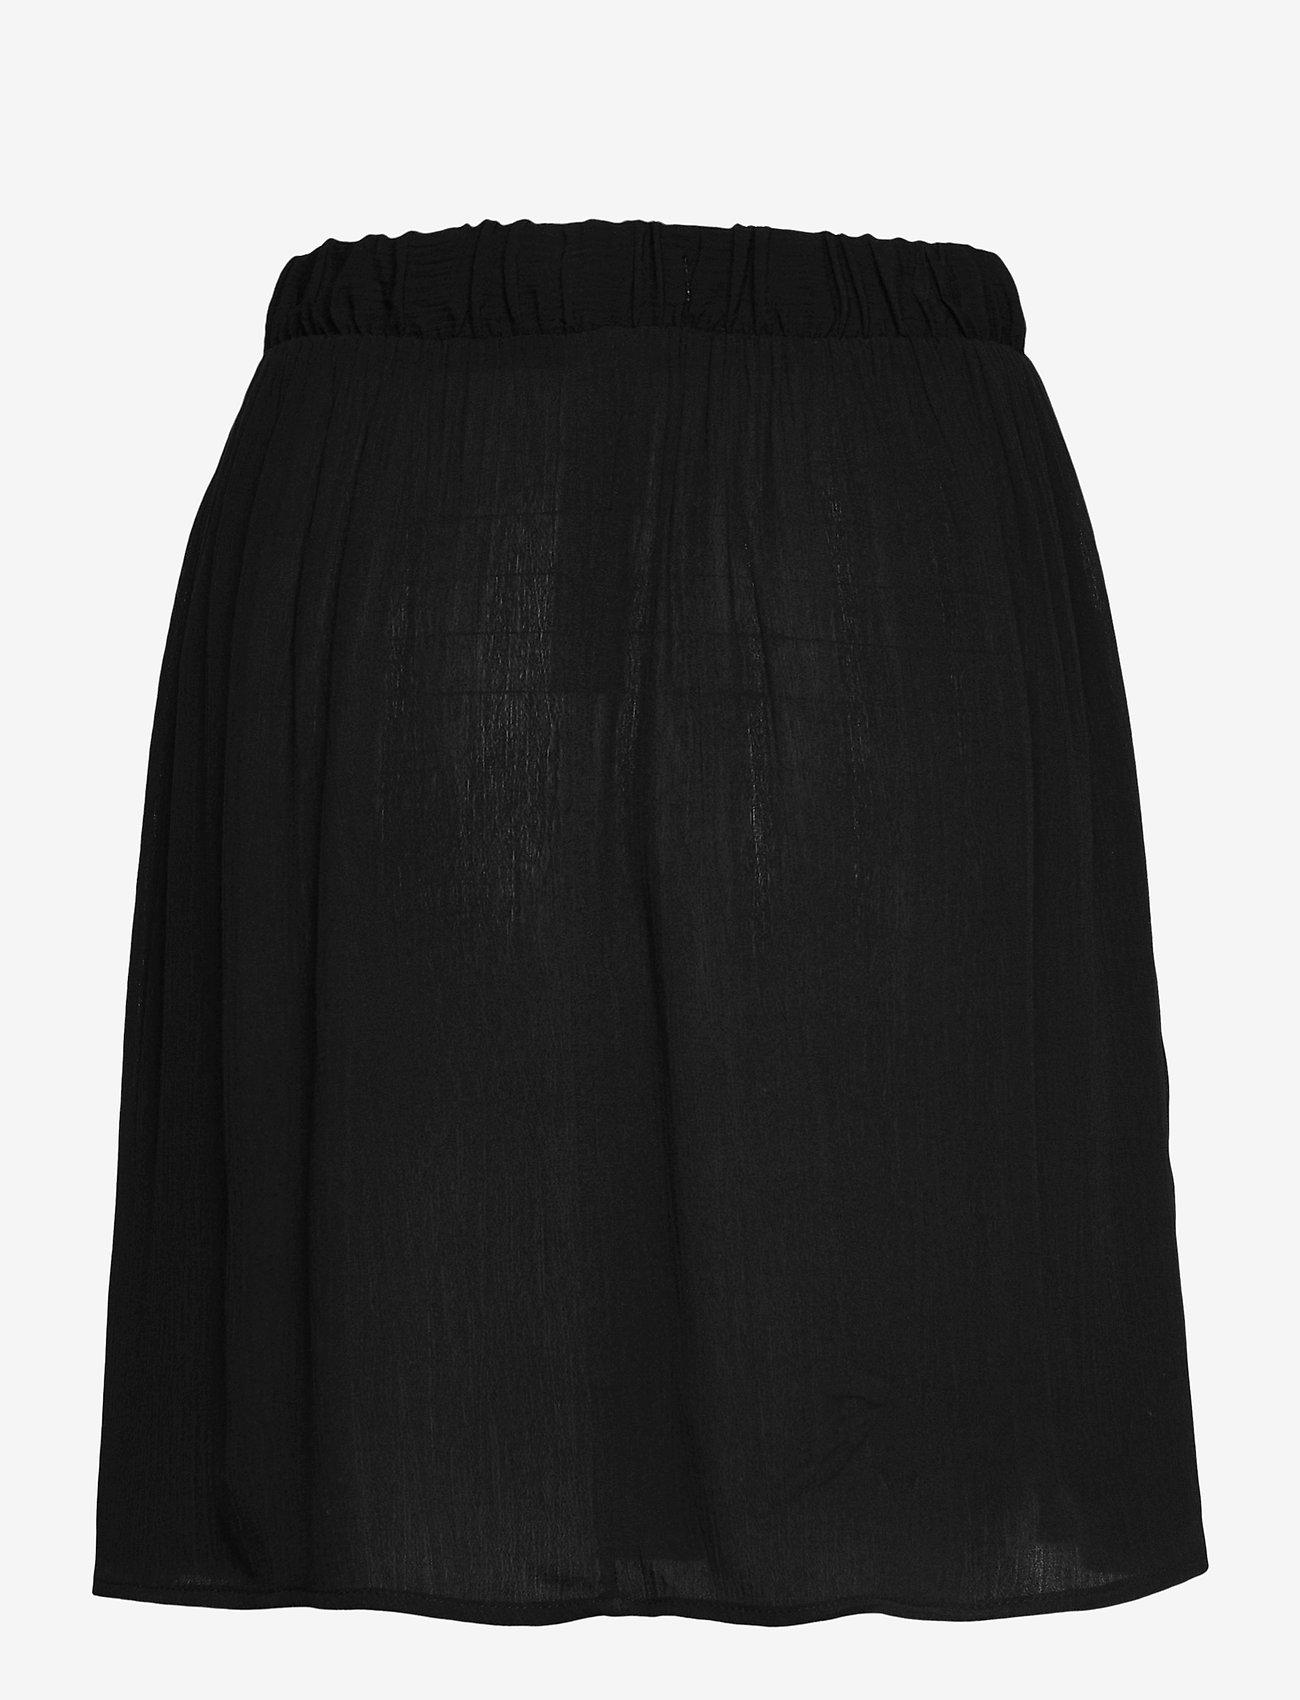 ICHI - IHMARRAKECH SO SK - short skirts - black - 1